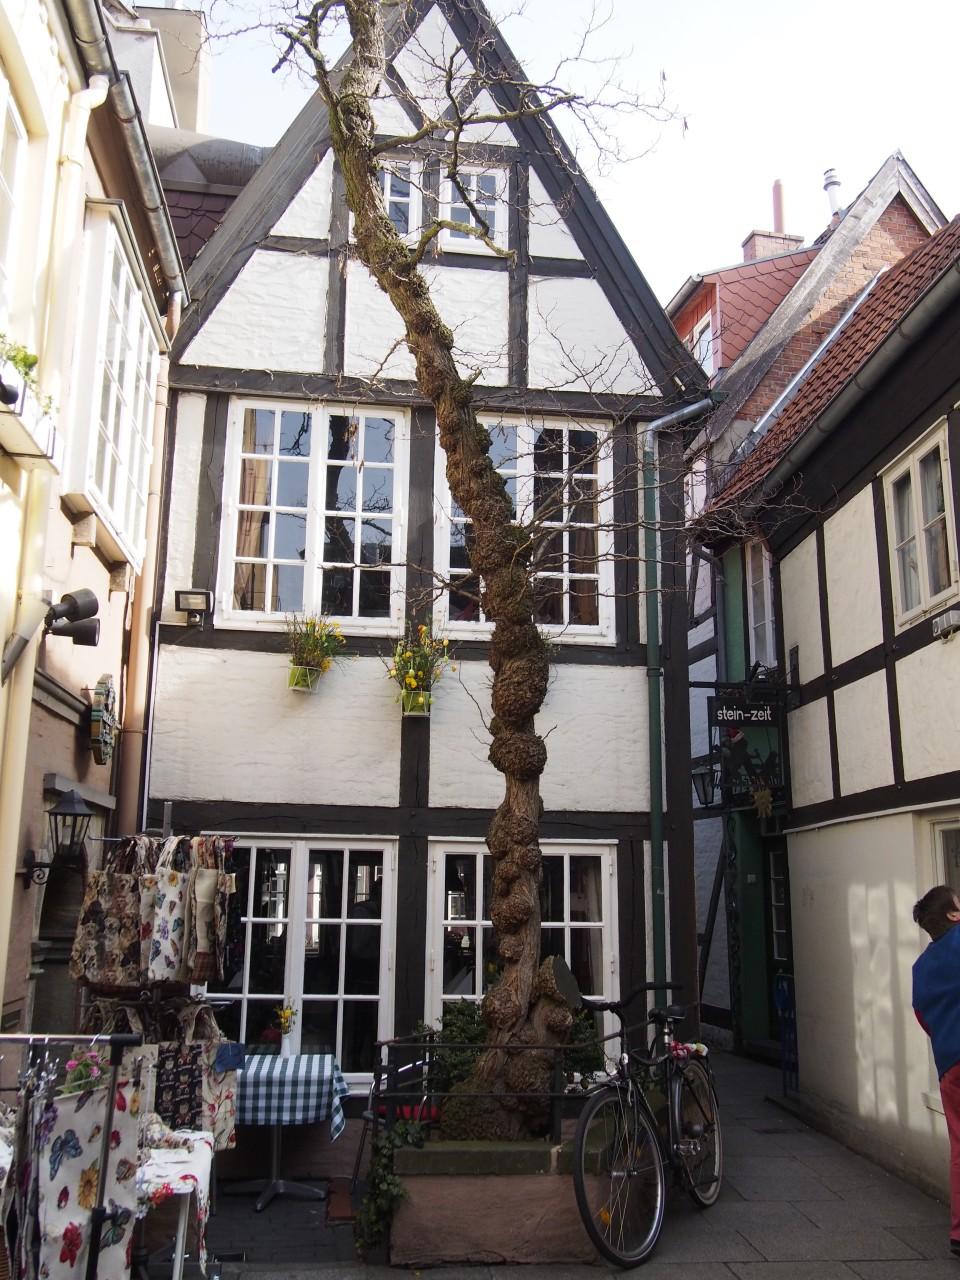 innerhalb des Schnoorivertels in Bremen